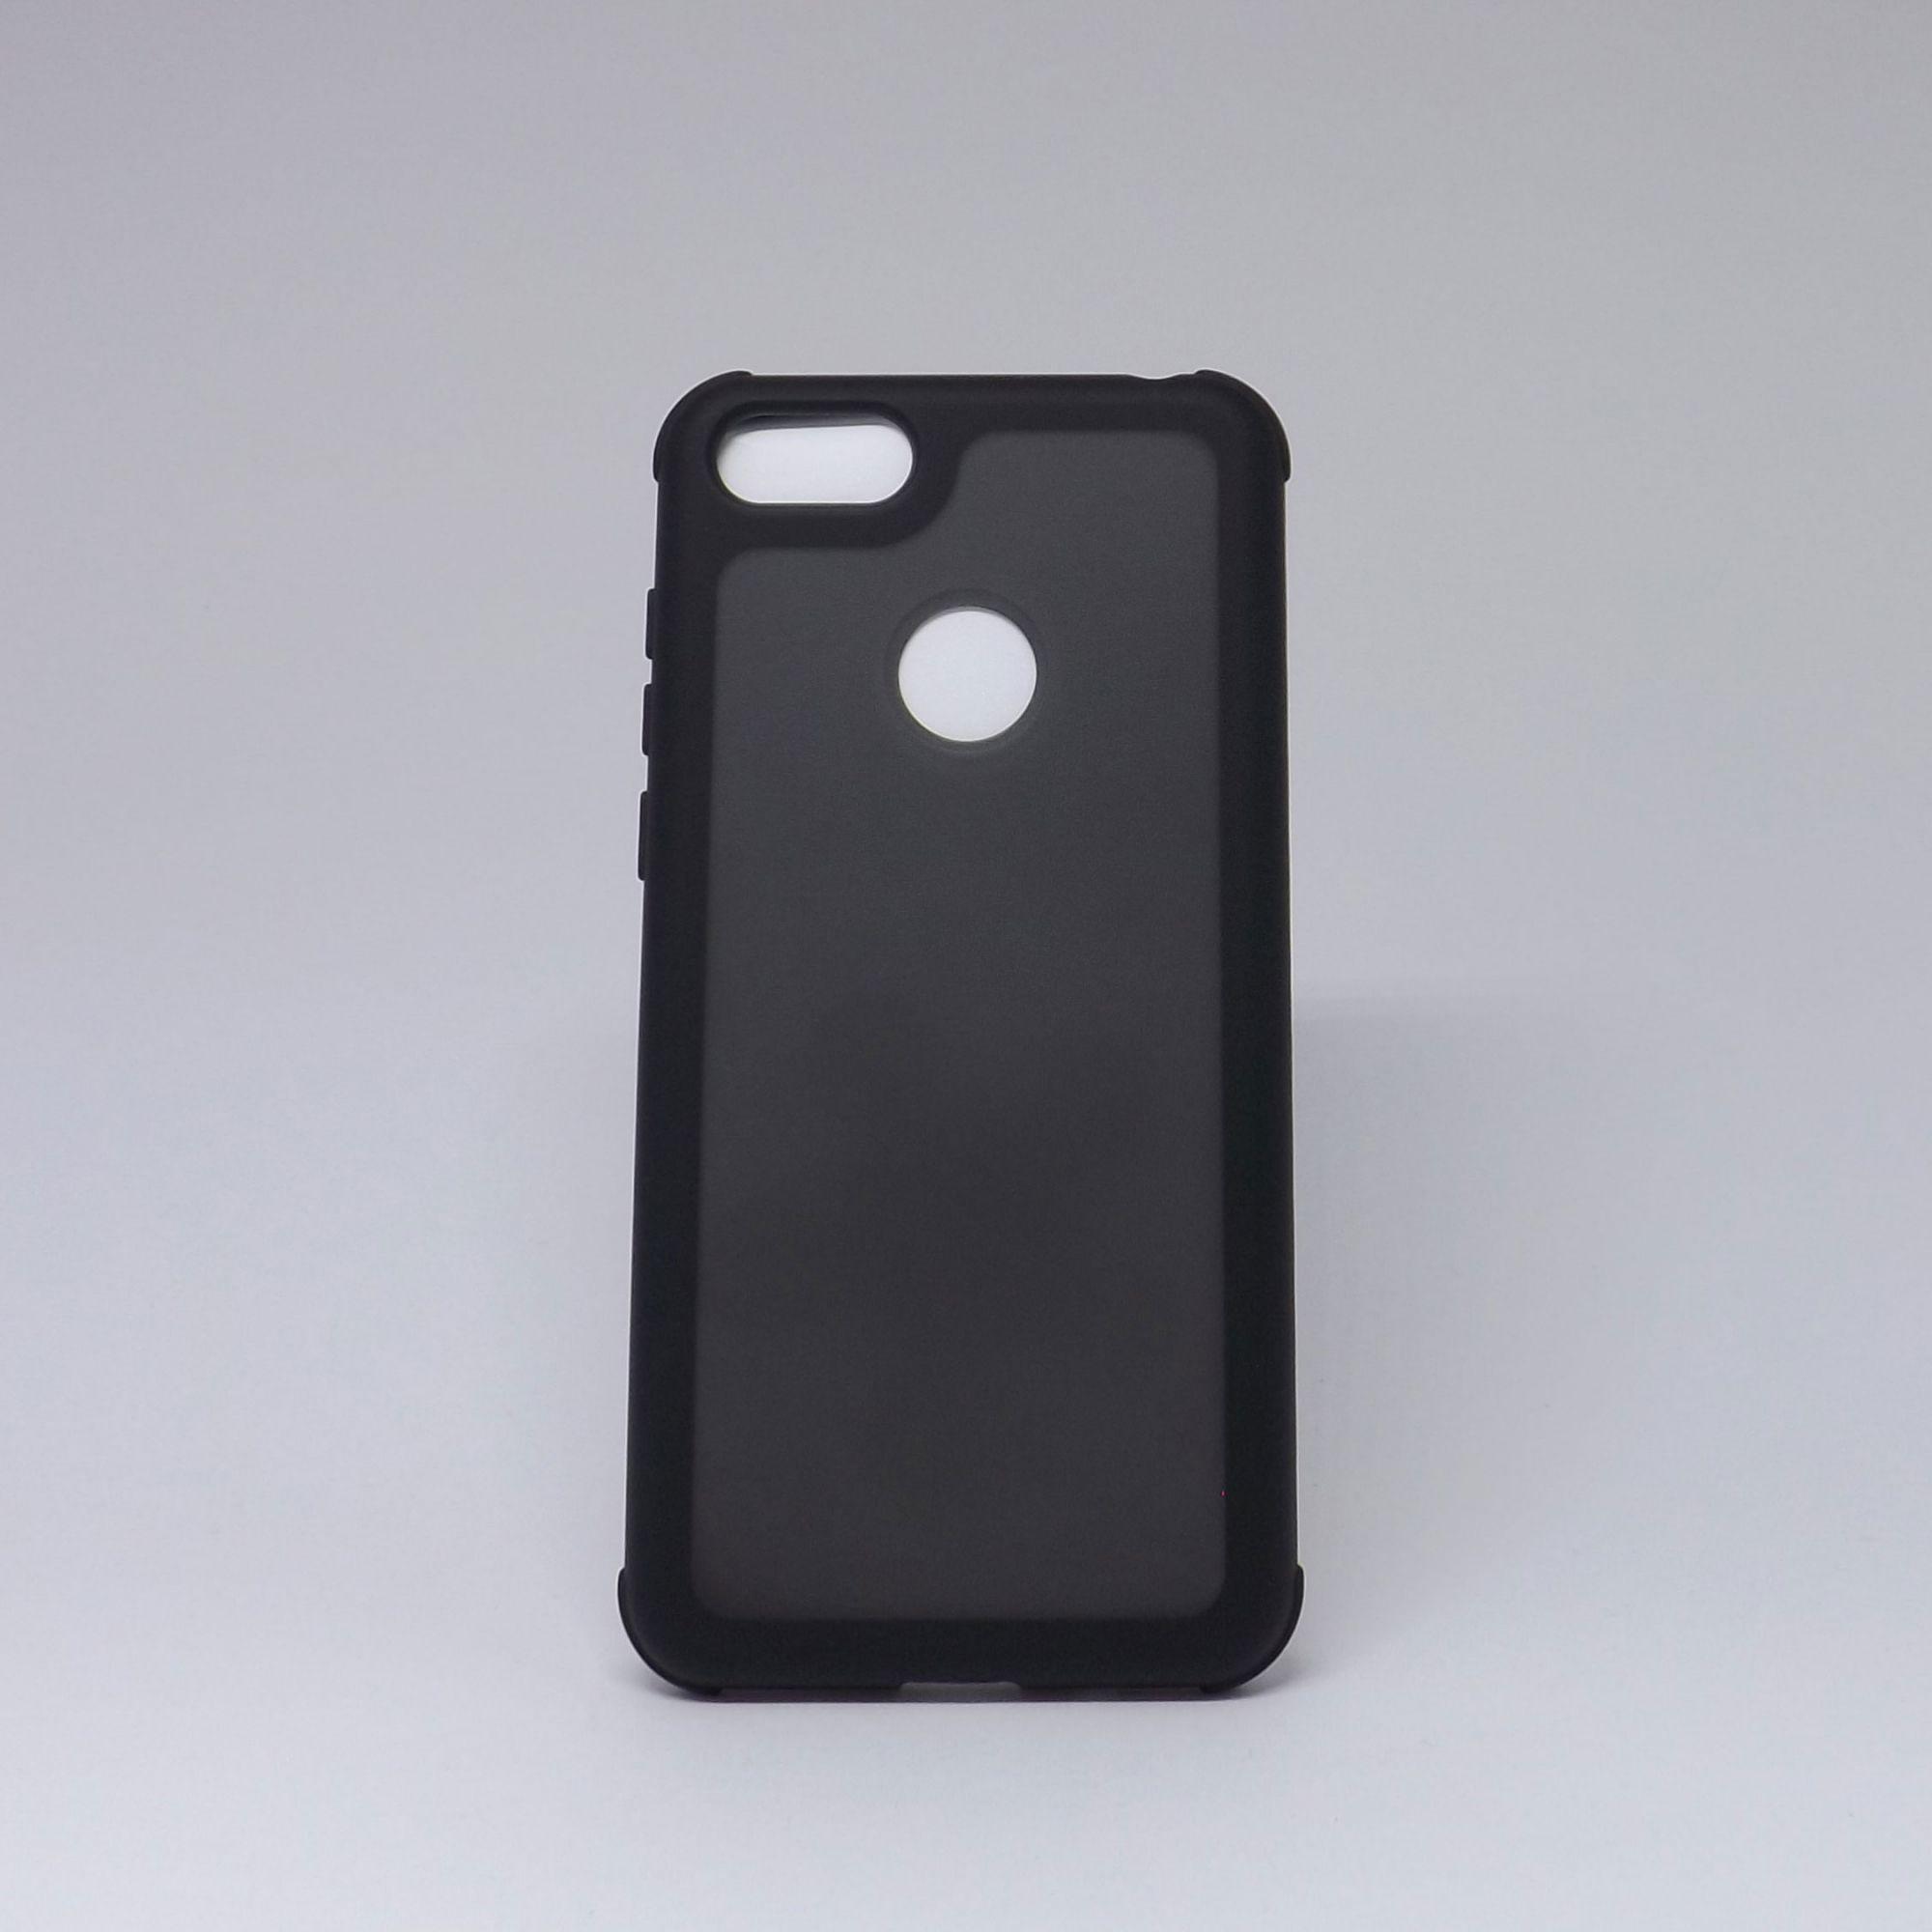 Capa Motorola E6 Play Fumê com Borda Colorida